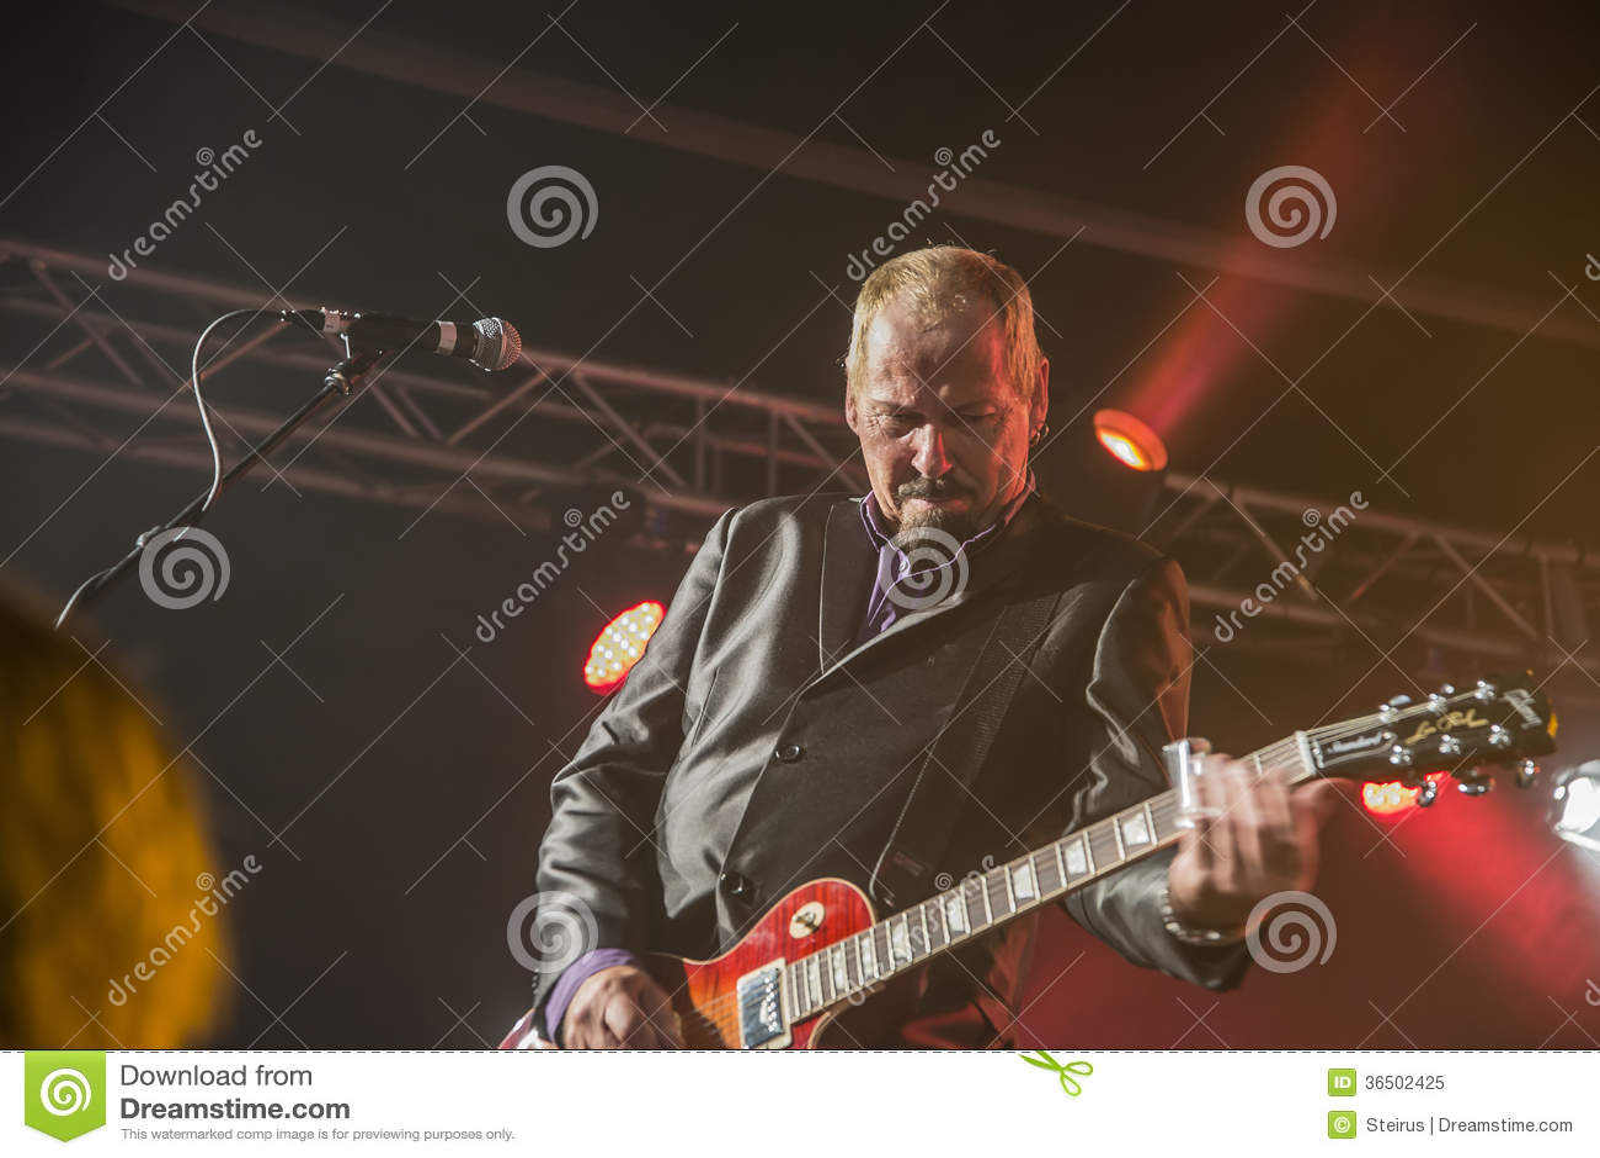 jon nichols plays guitar editorial image image 36502425 bass guitar clipart black and white bass guitar clipart